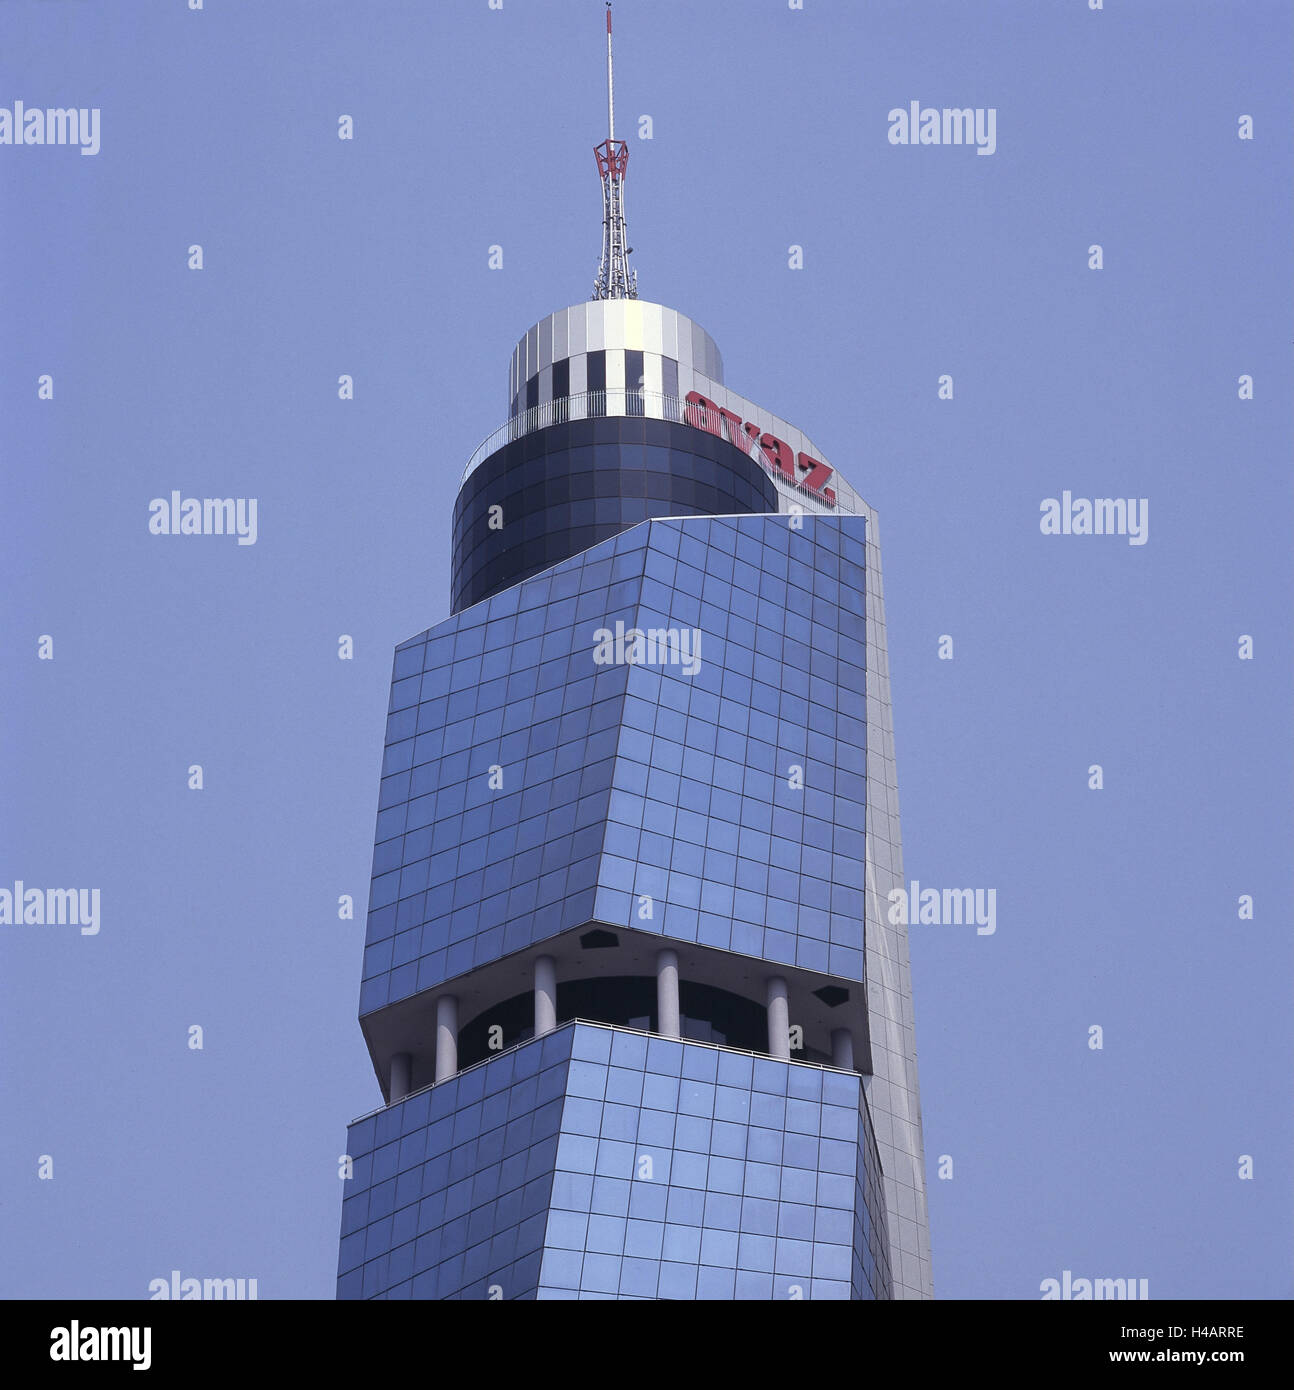 Bosnia-Herzegovina, Sarajevo, Avaz Twist Tower, high-rise office block, - Stock Image